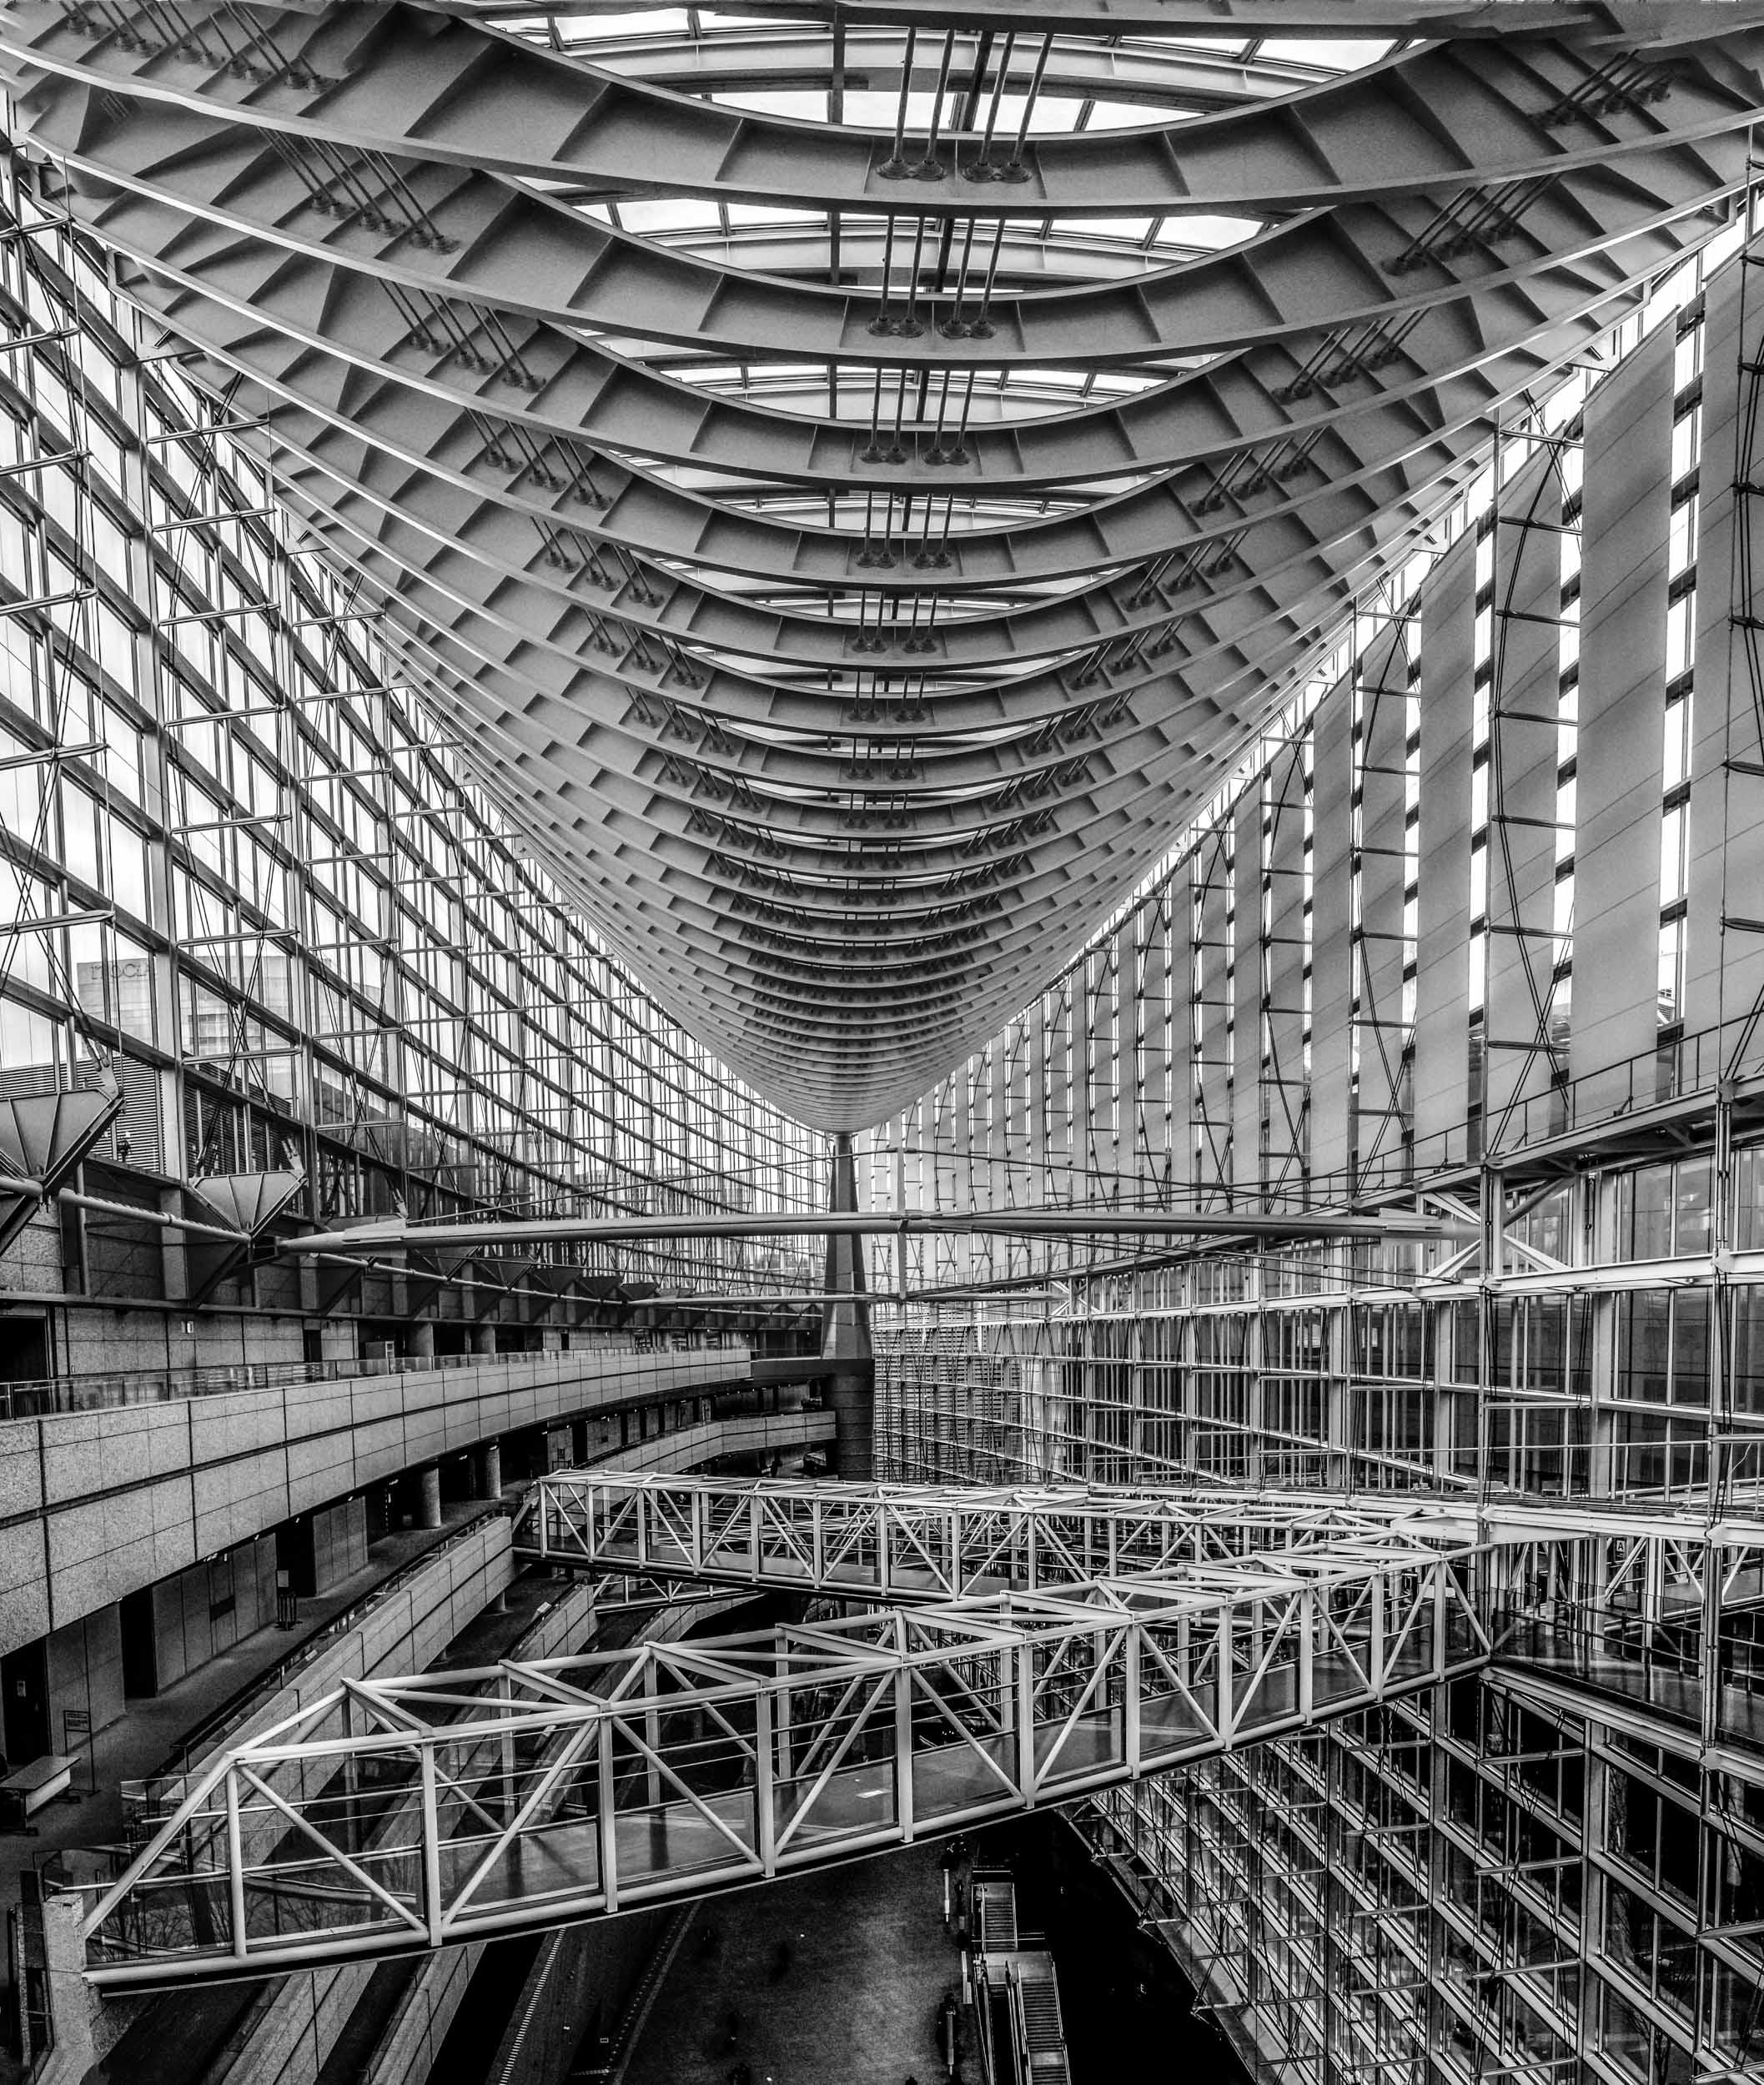 Tokyo International Forum - an architectural photographer's dream